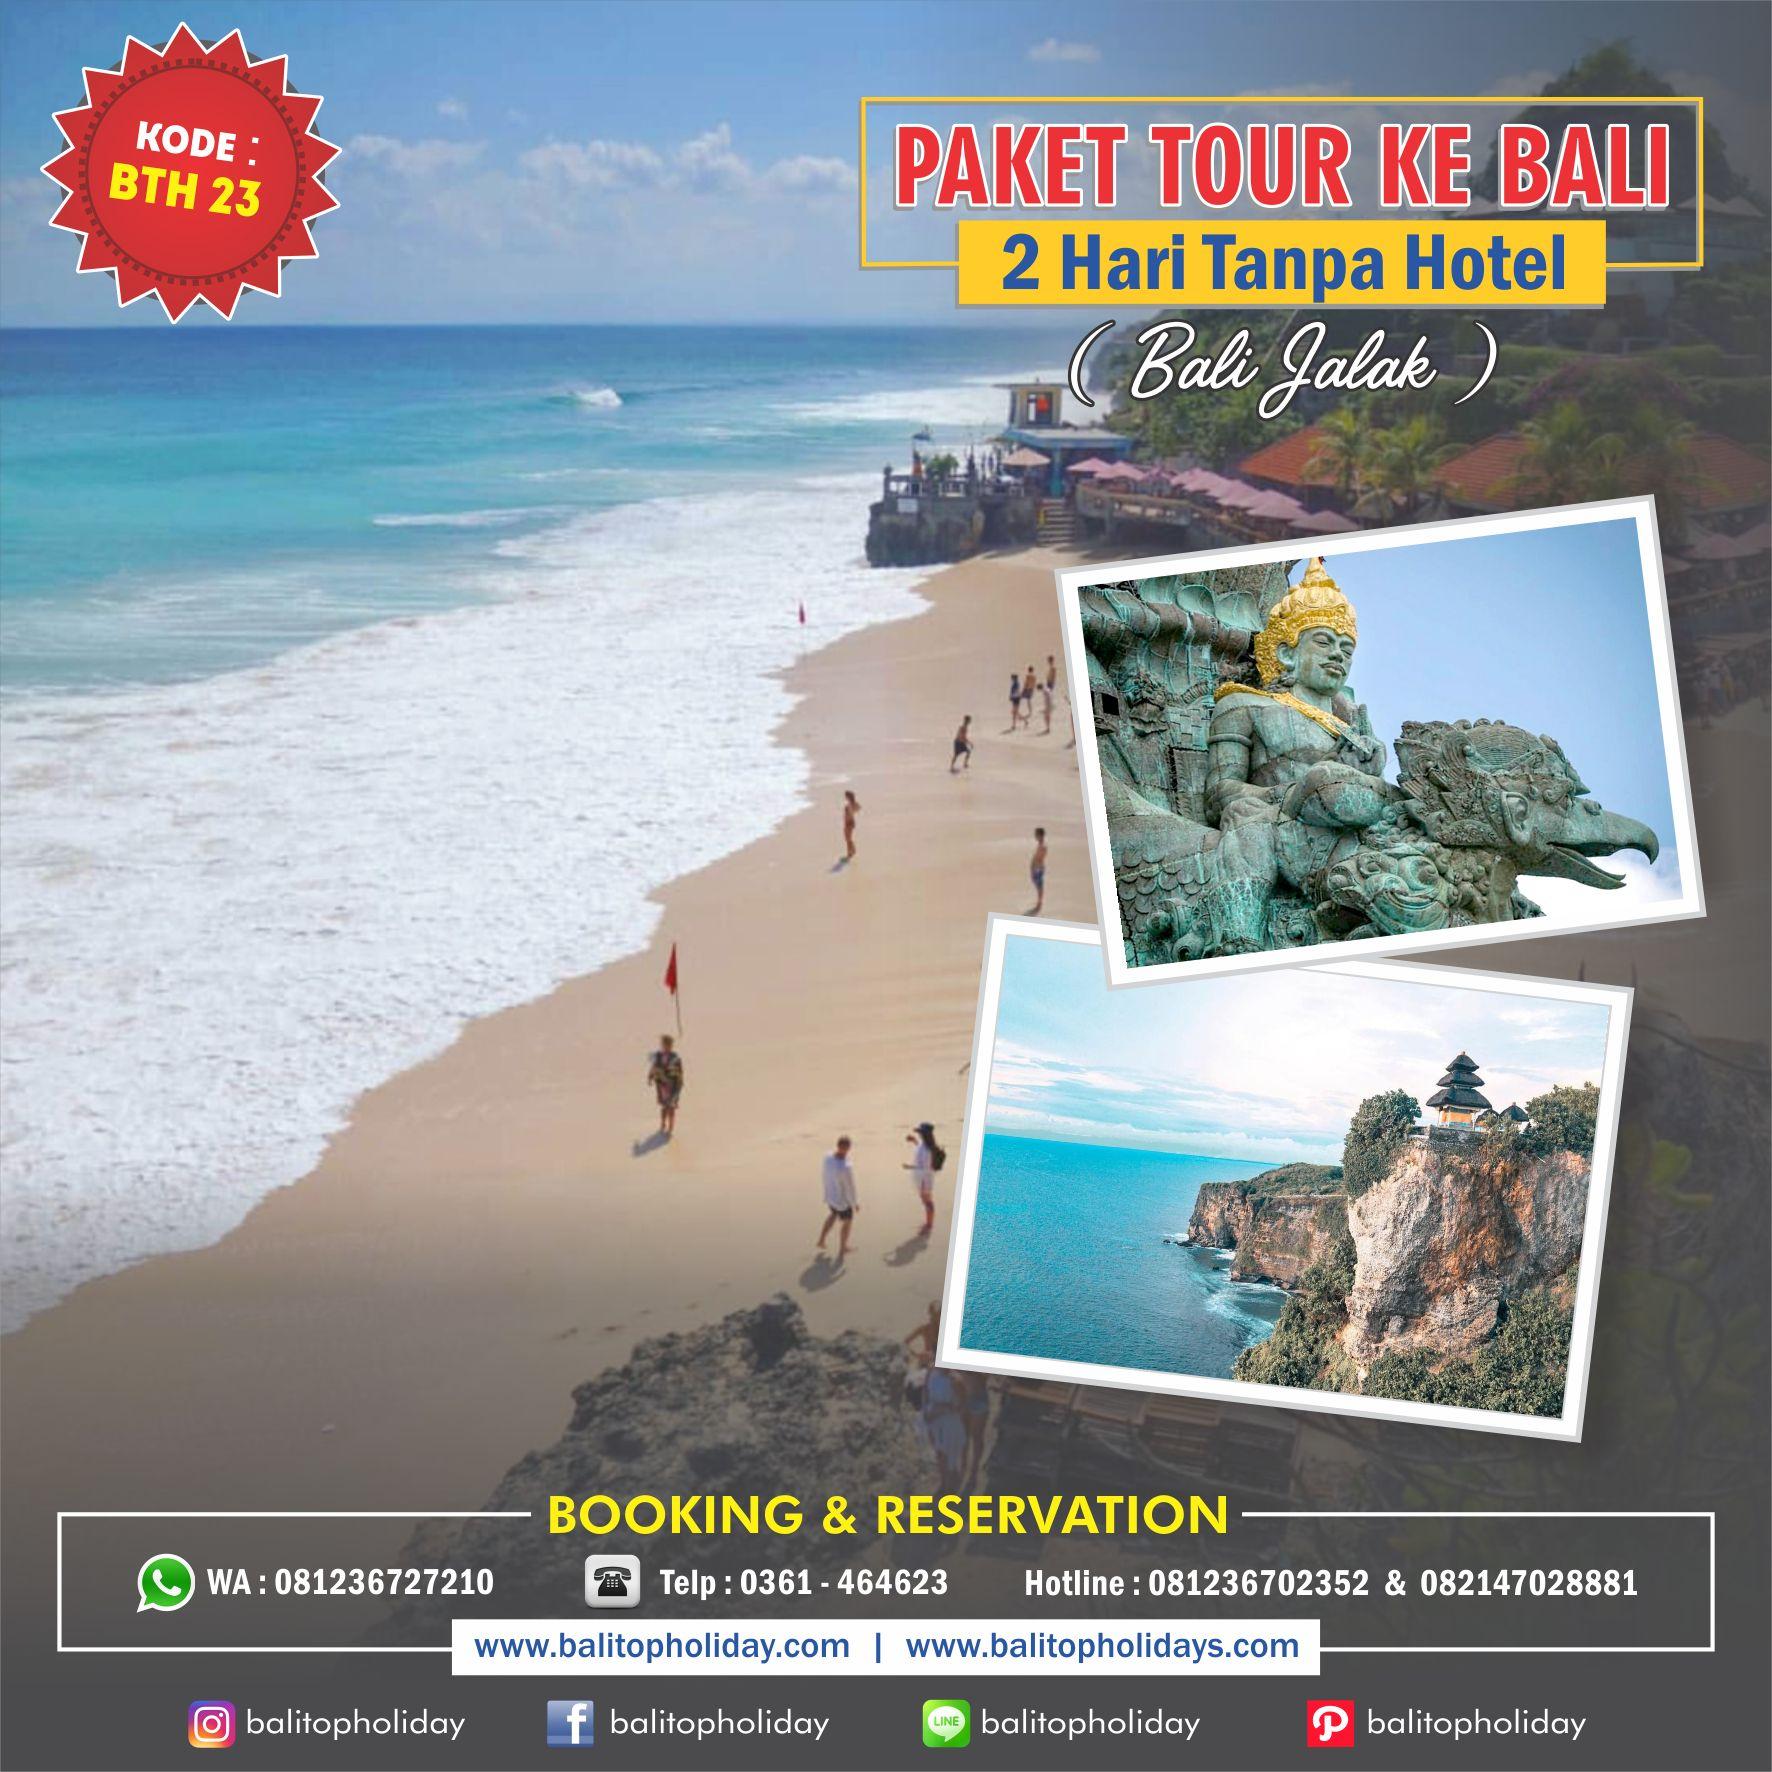 2H tanpa hotel BTH 23 Bali Jalak